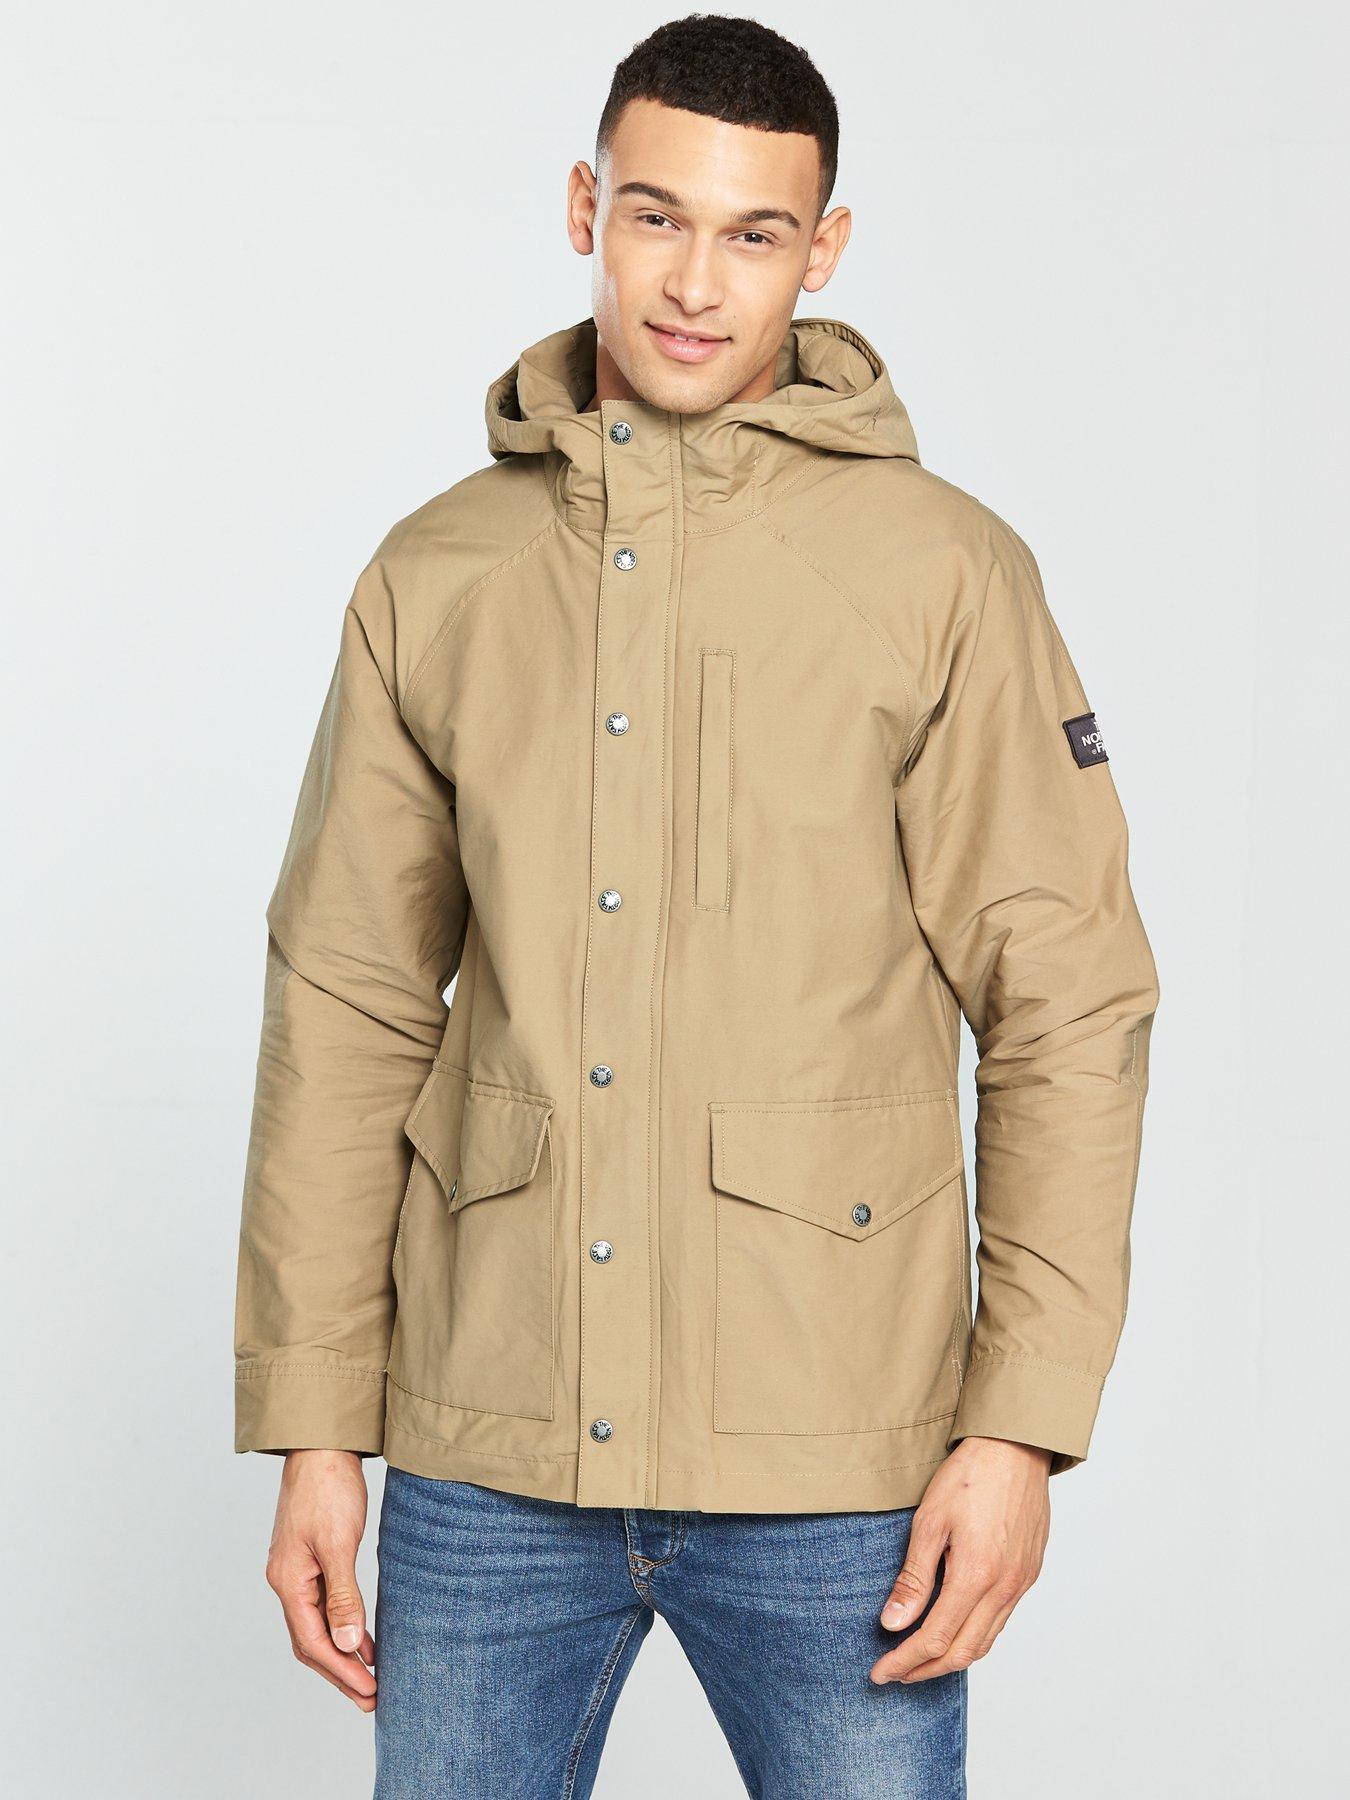 7ec02dc0ff6 new style north face utility vest fashion 00493 920b6